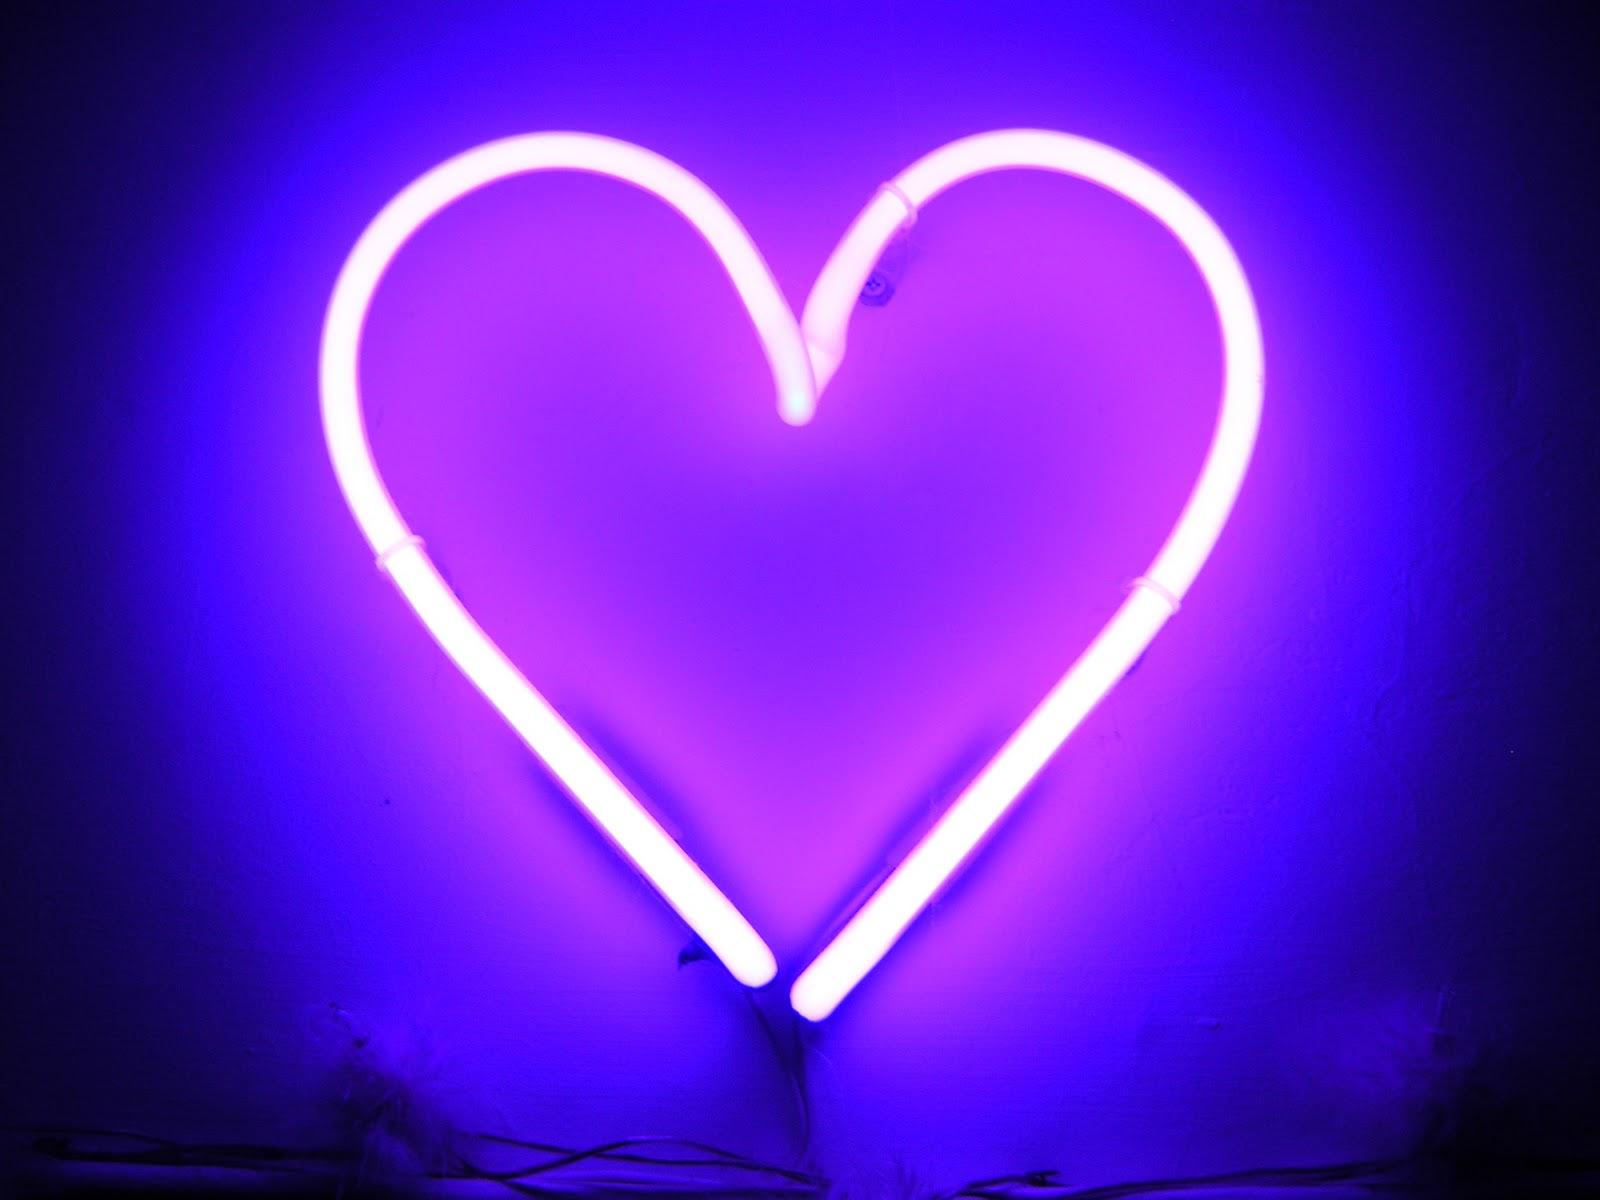 cool neon heart wallpaper - photo #23